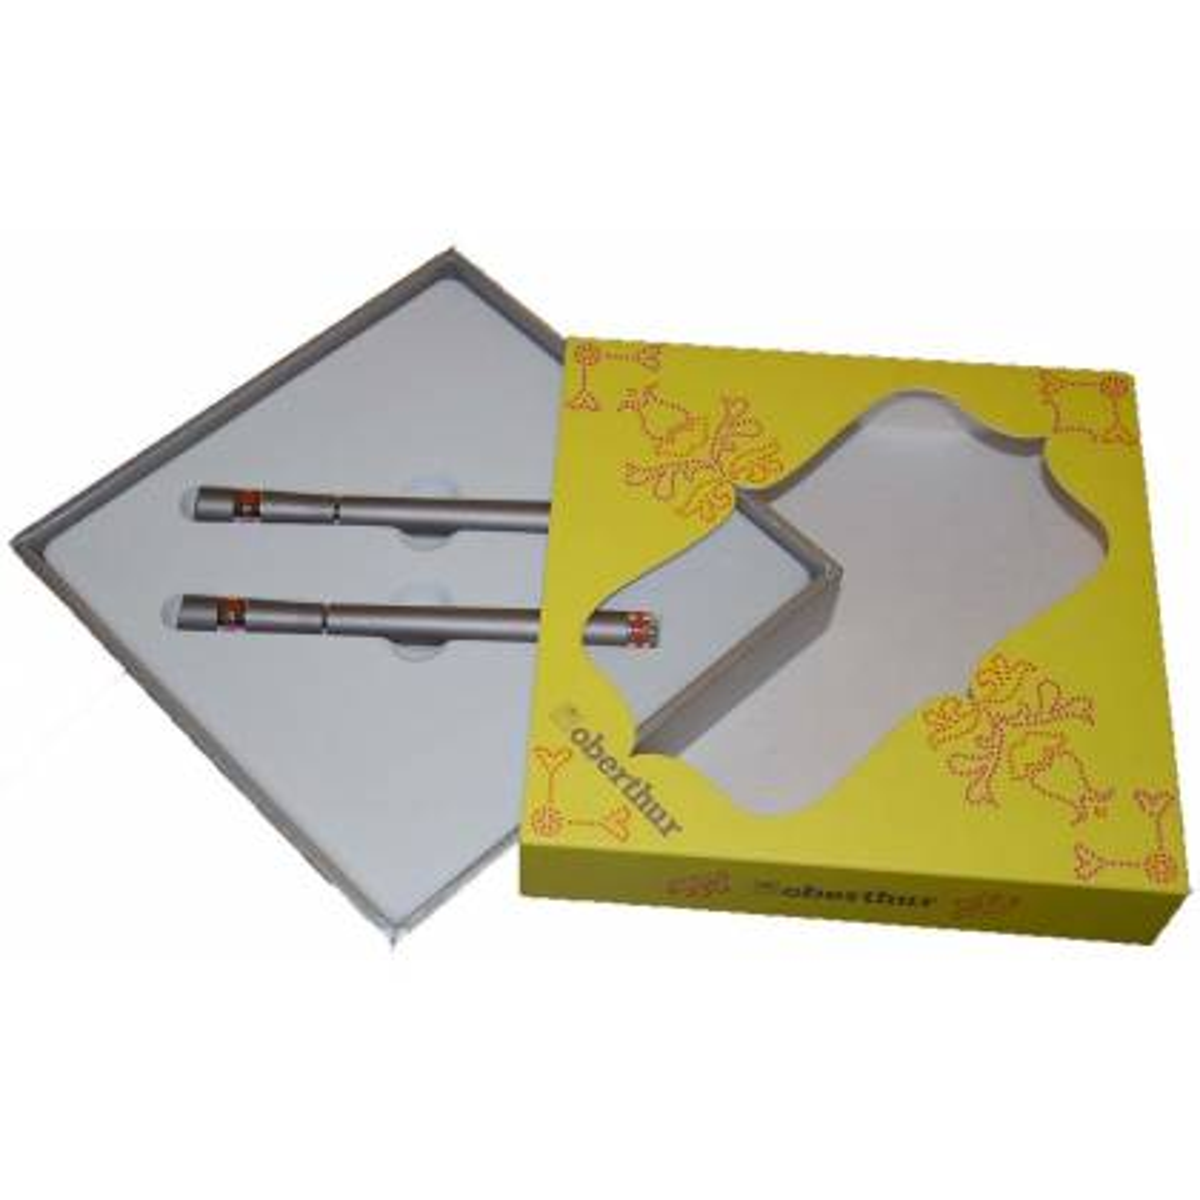 Parure Stylo plume + Roller Oberthur Indian Bazar yellow